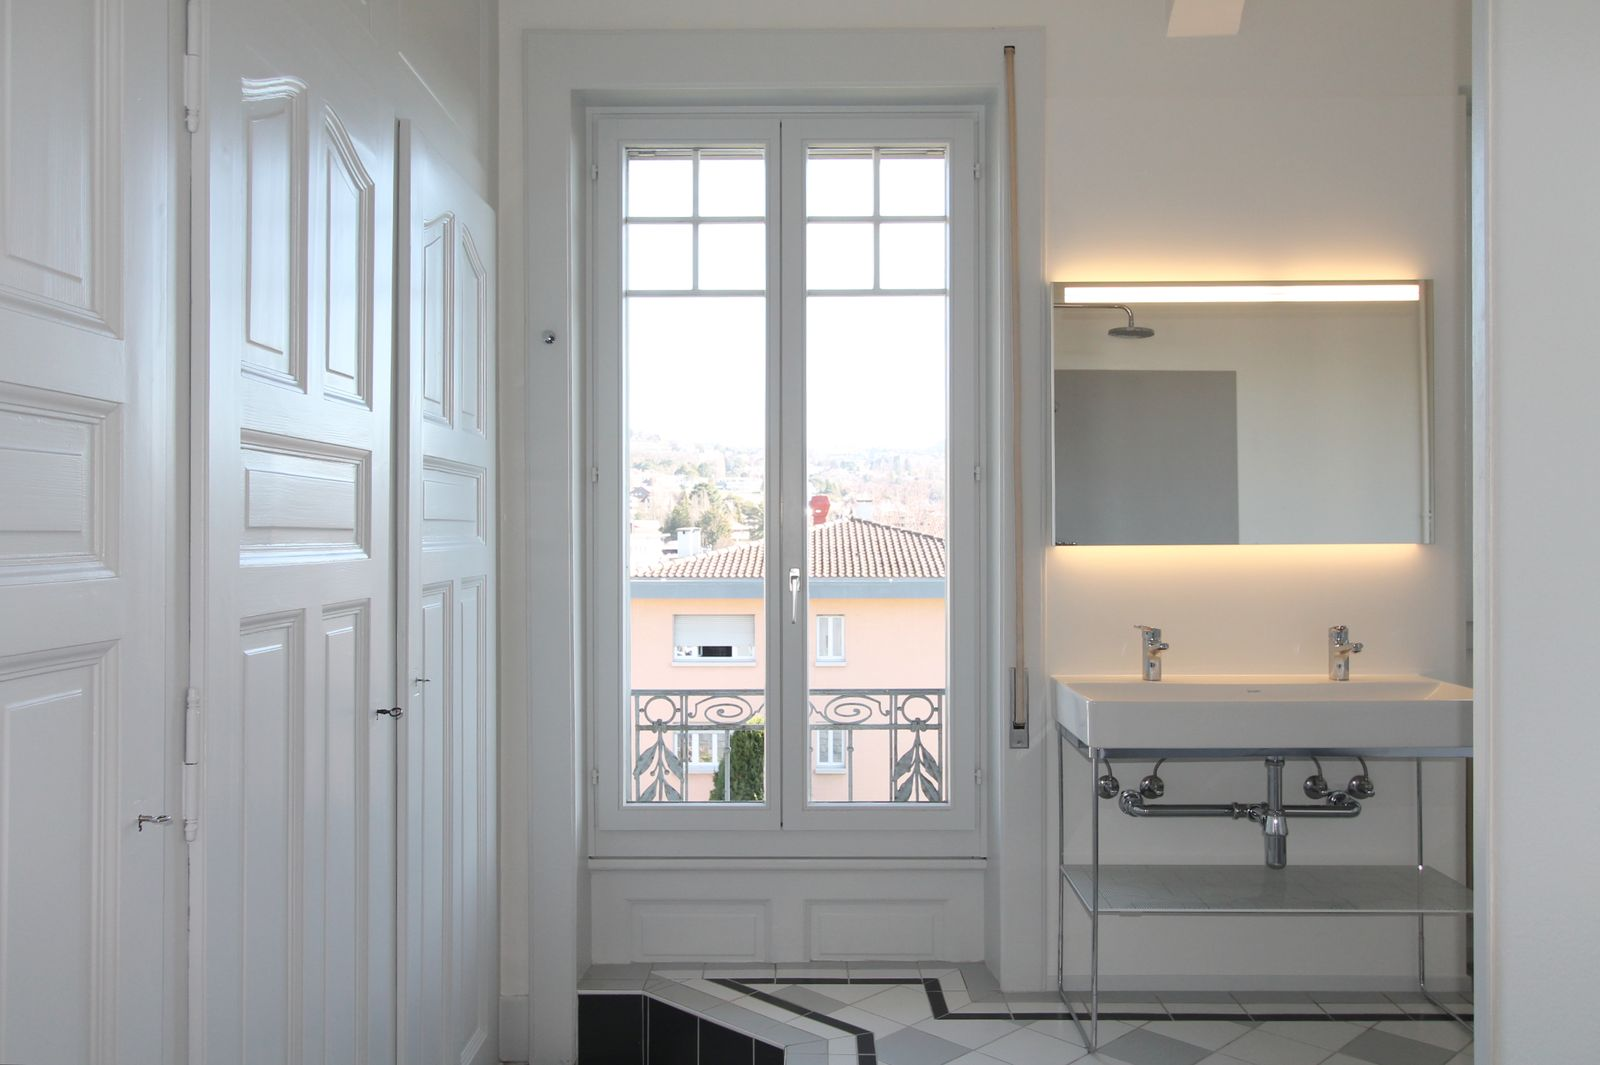 Lumineuse salle-de-bains contemporaine